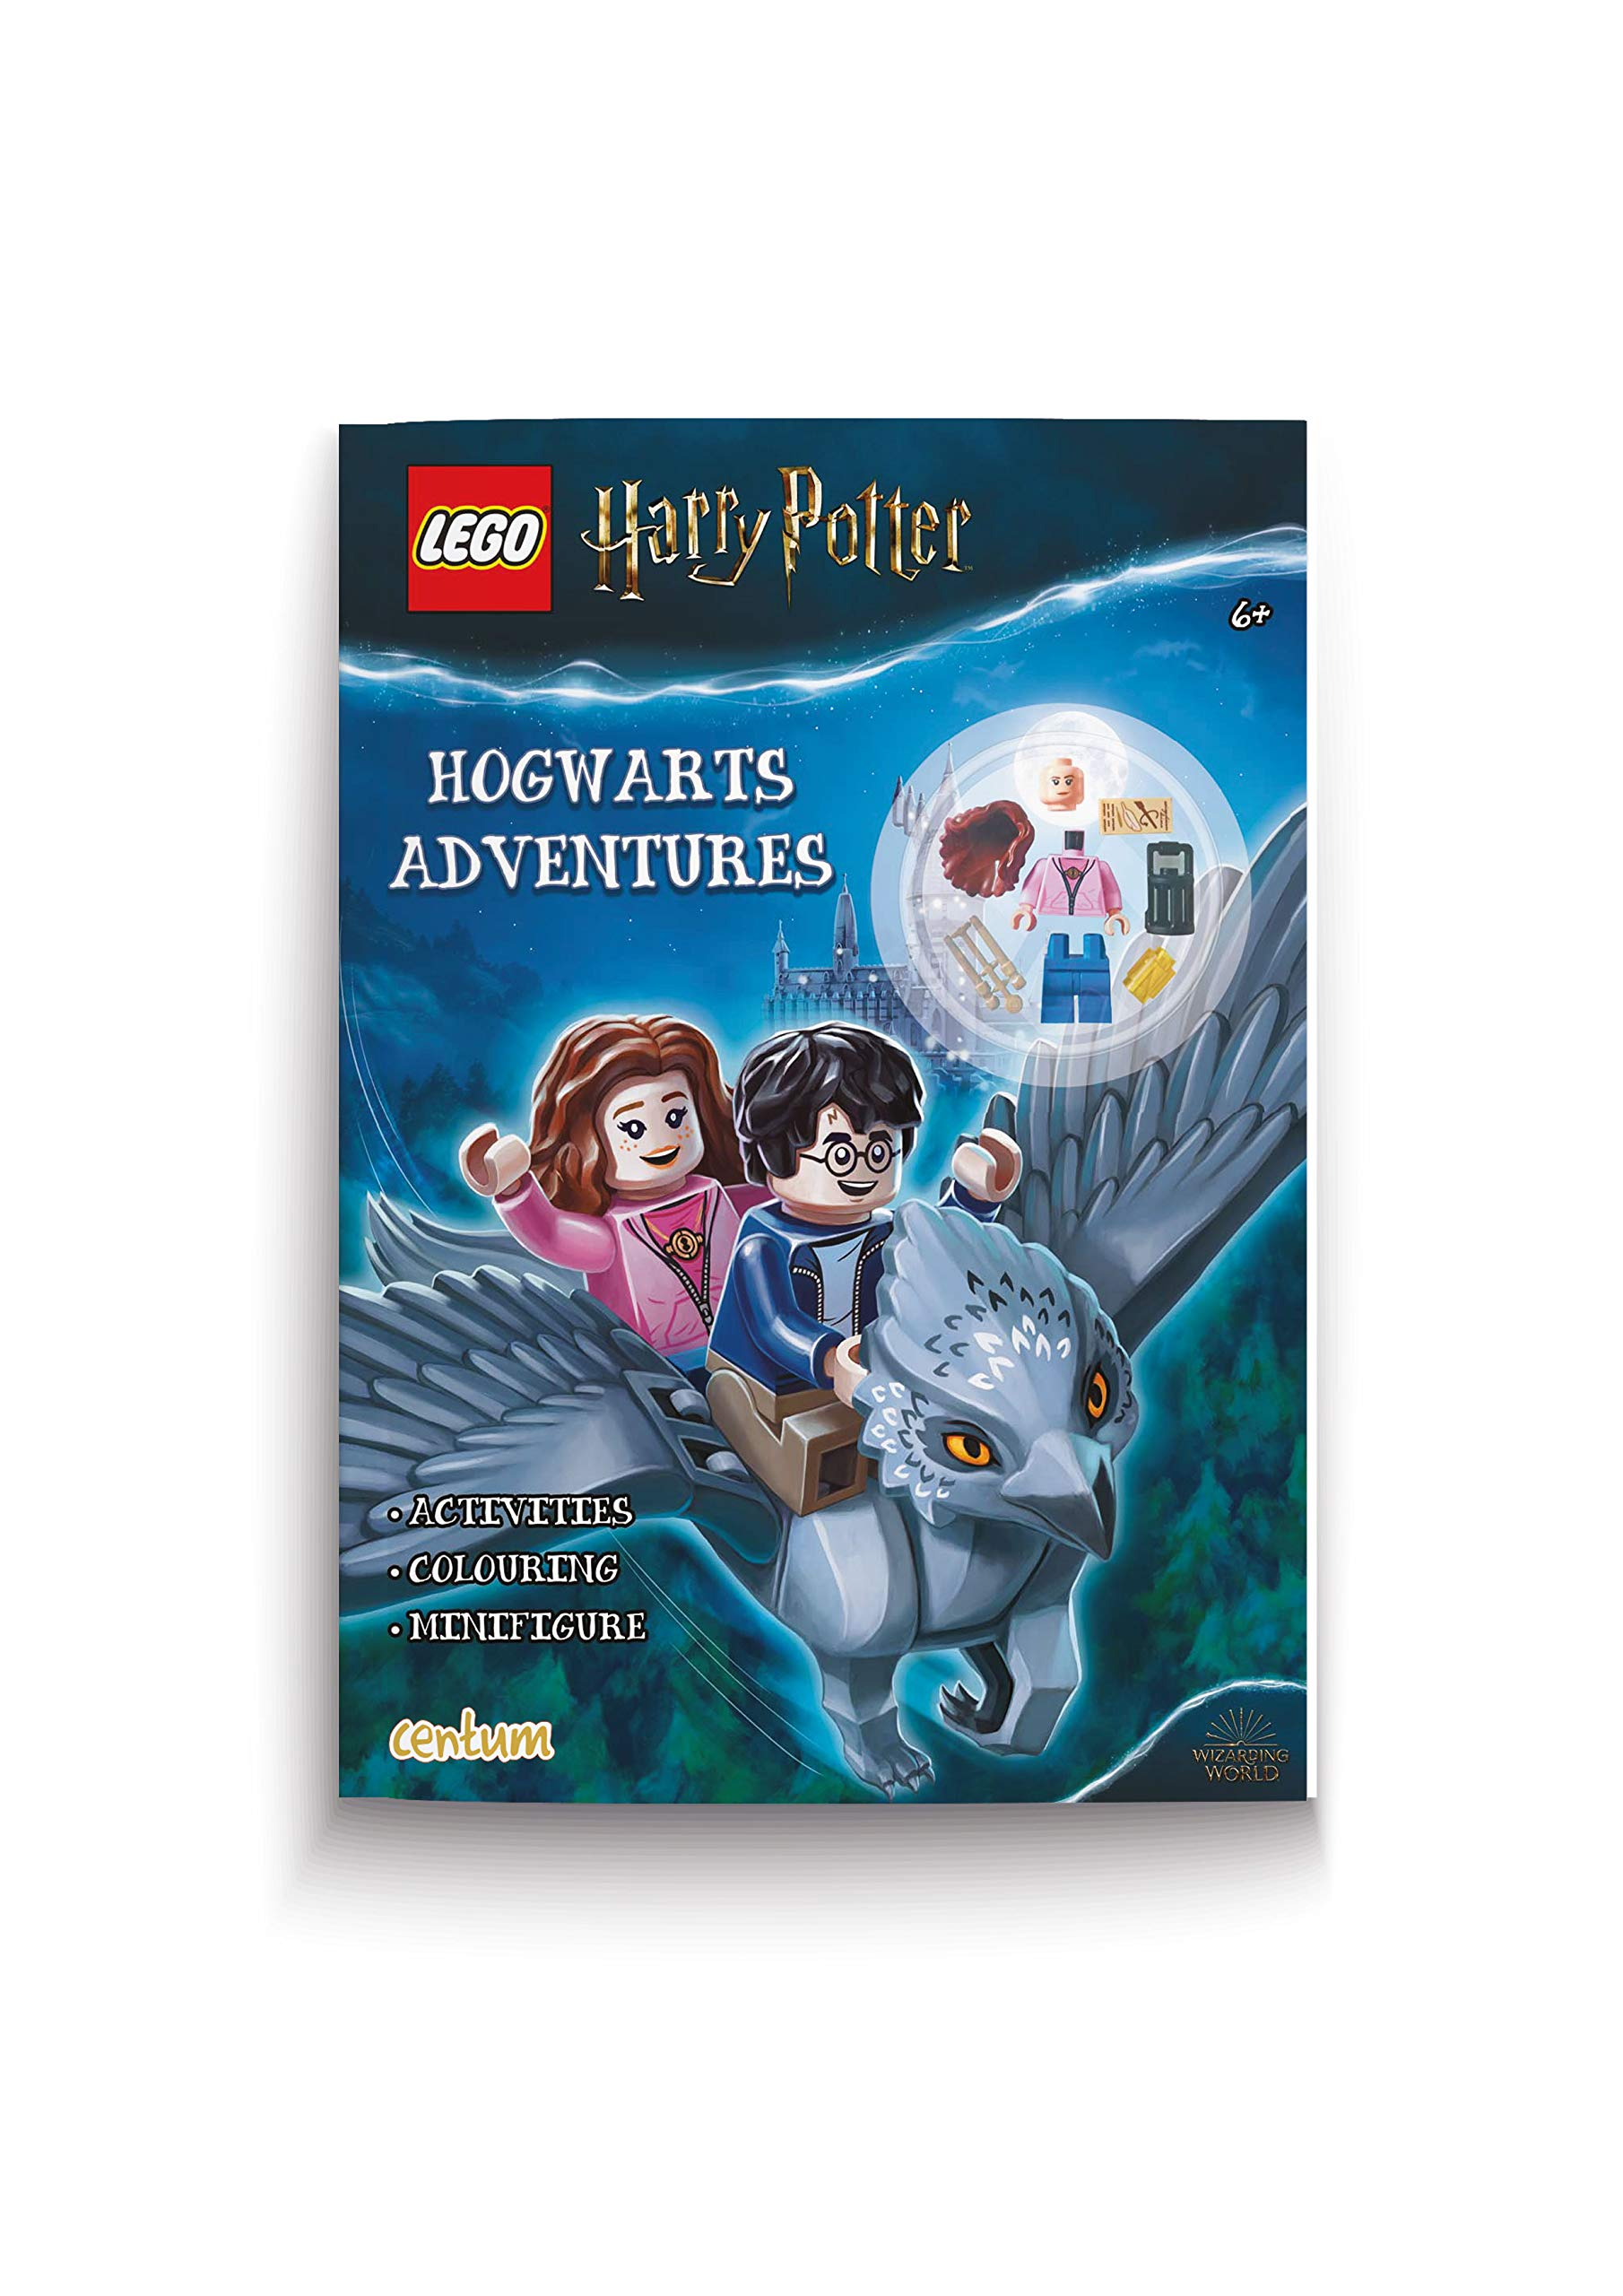 LEGO Harry Potter Hogwarts Adventures Lego Mini Figure ...